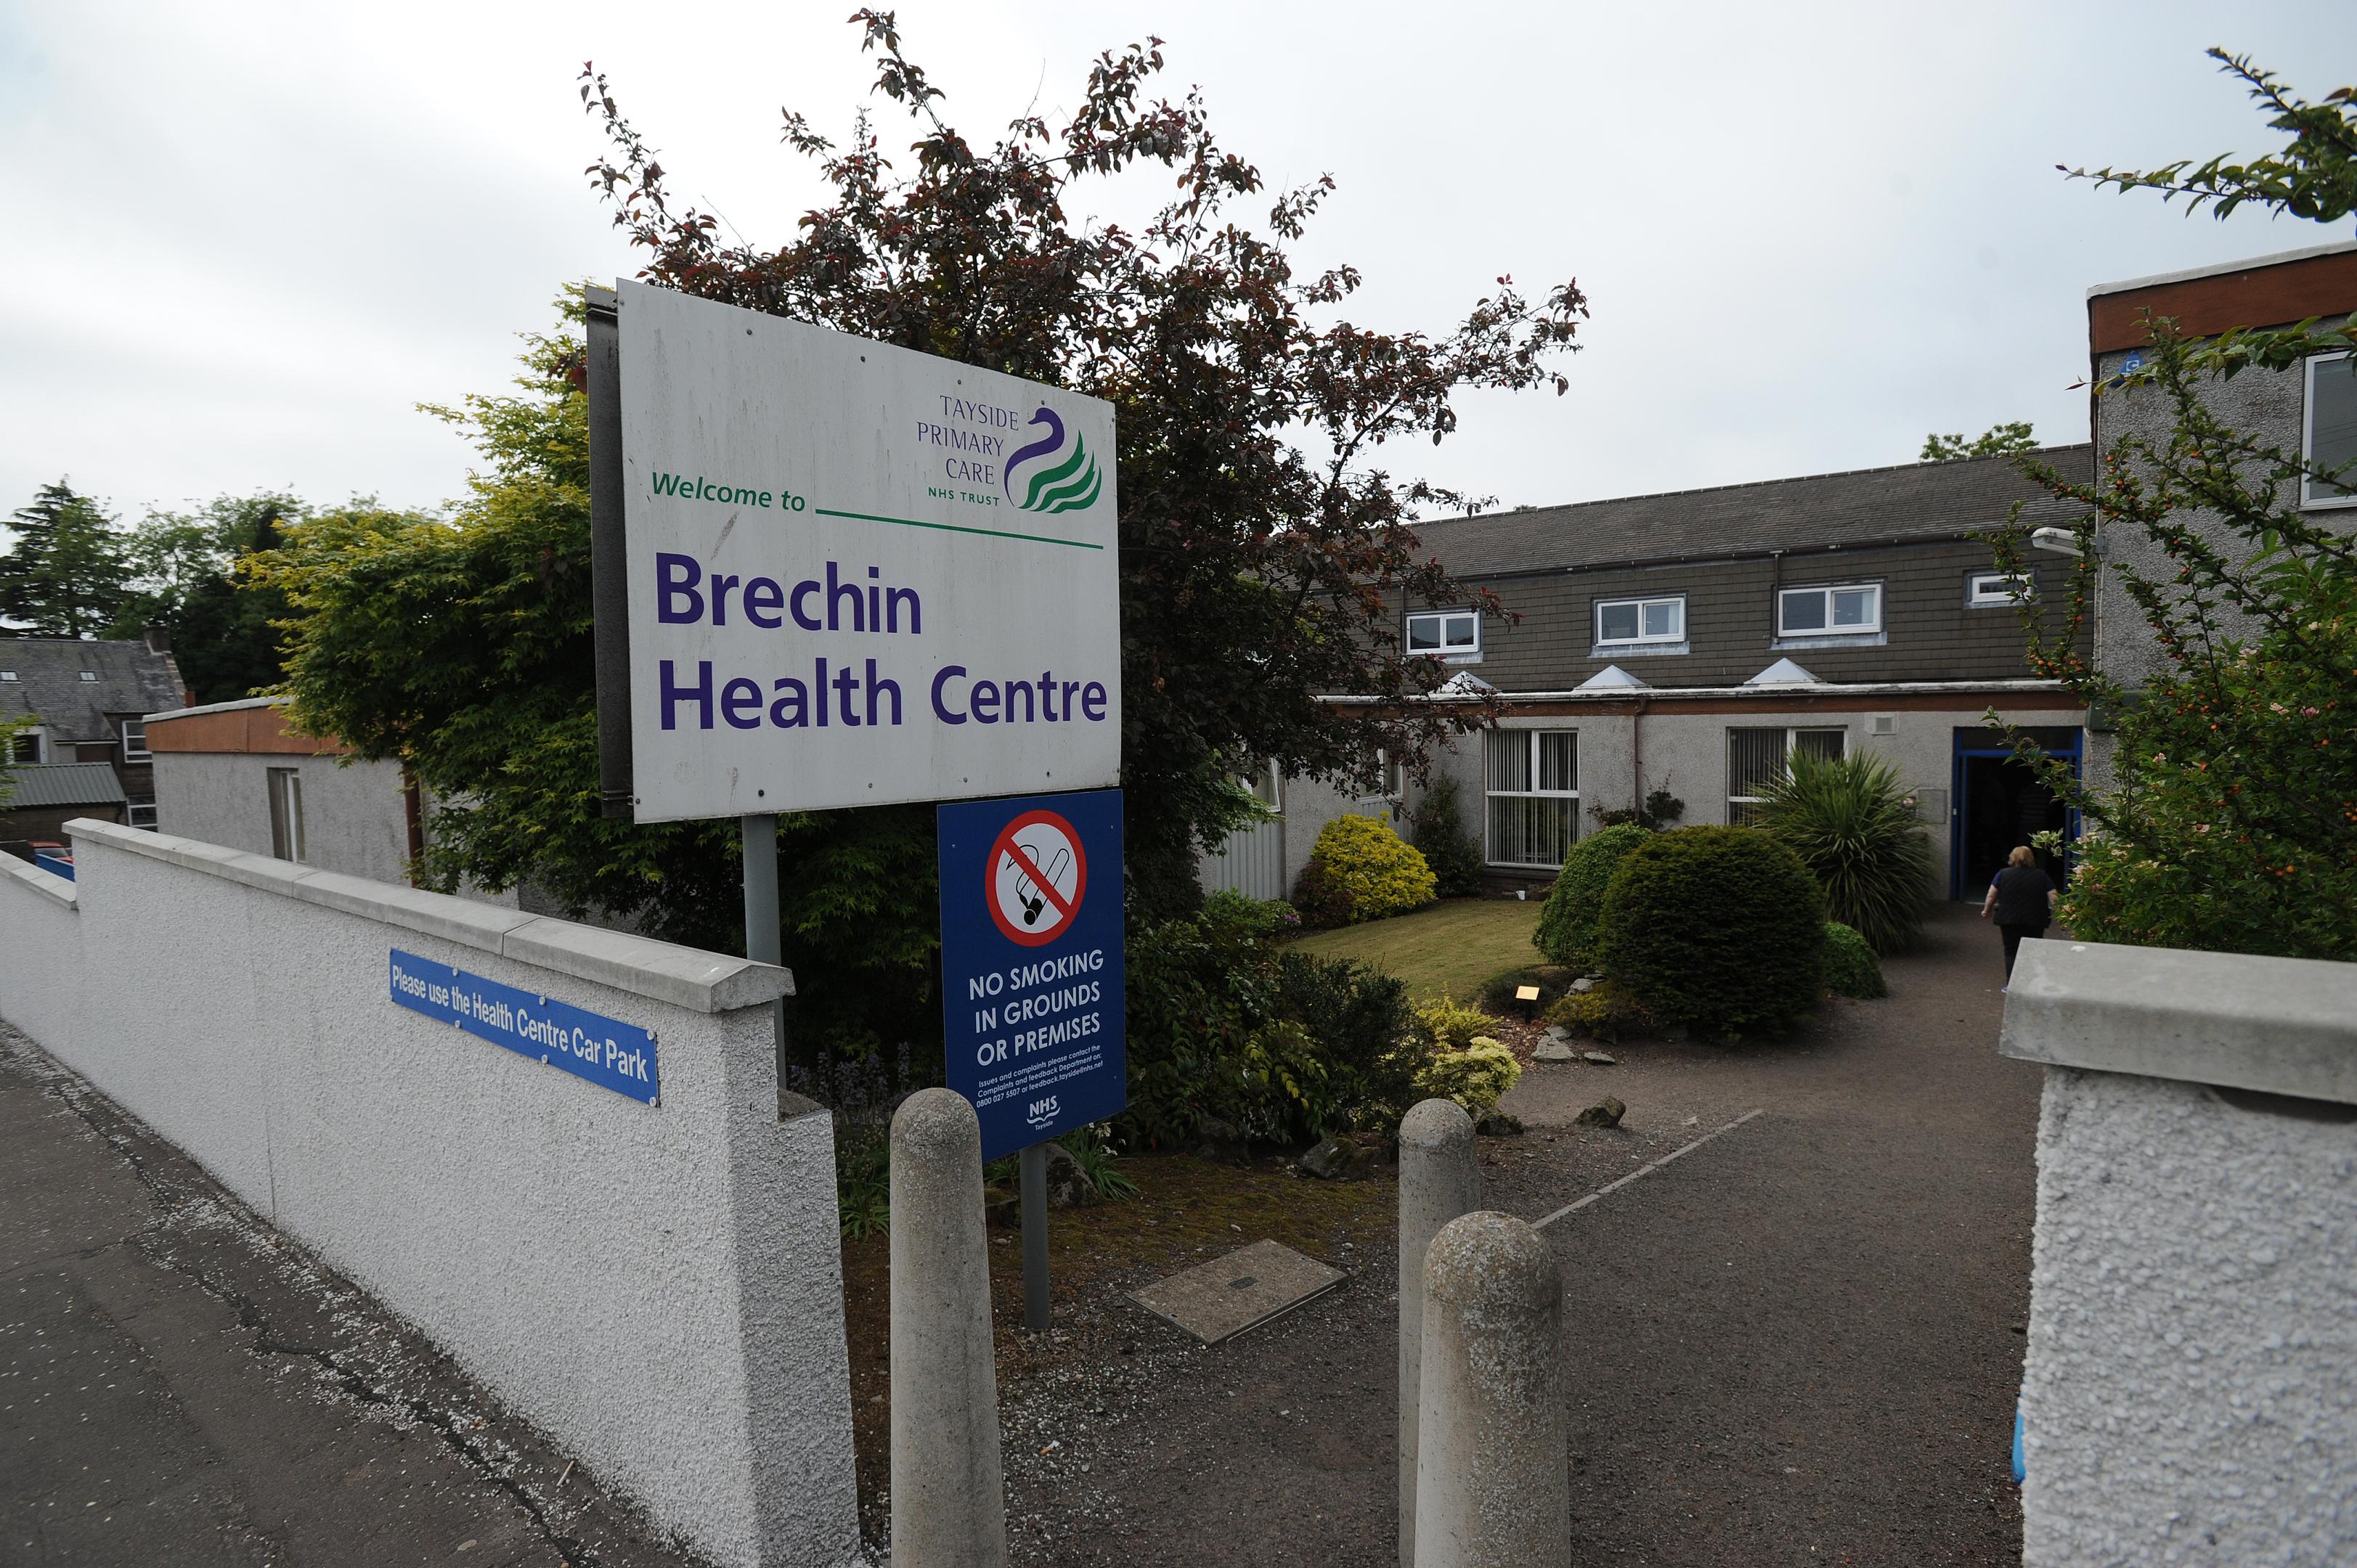 Brechiin Health Centre.